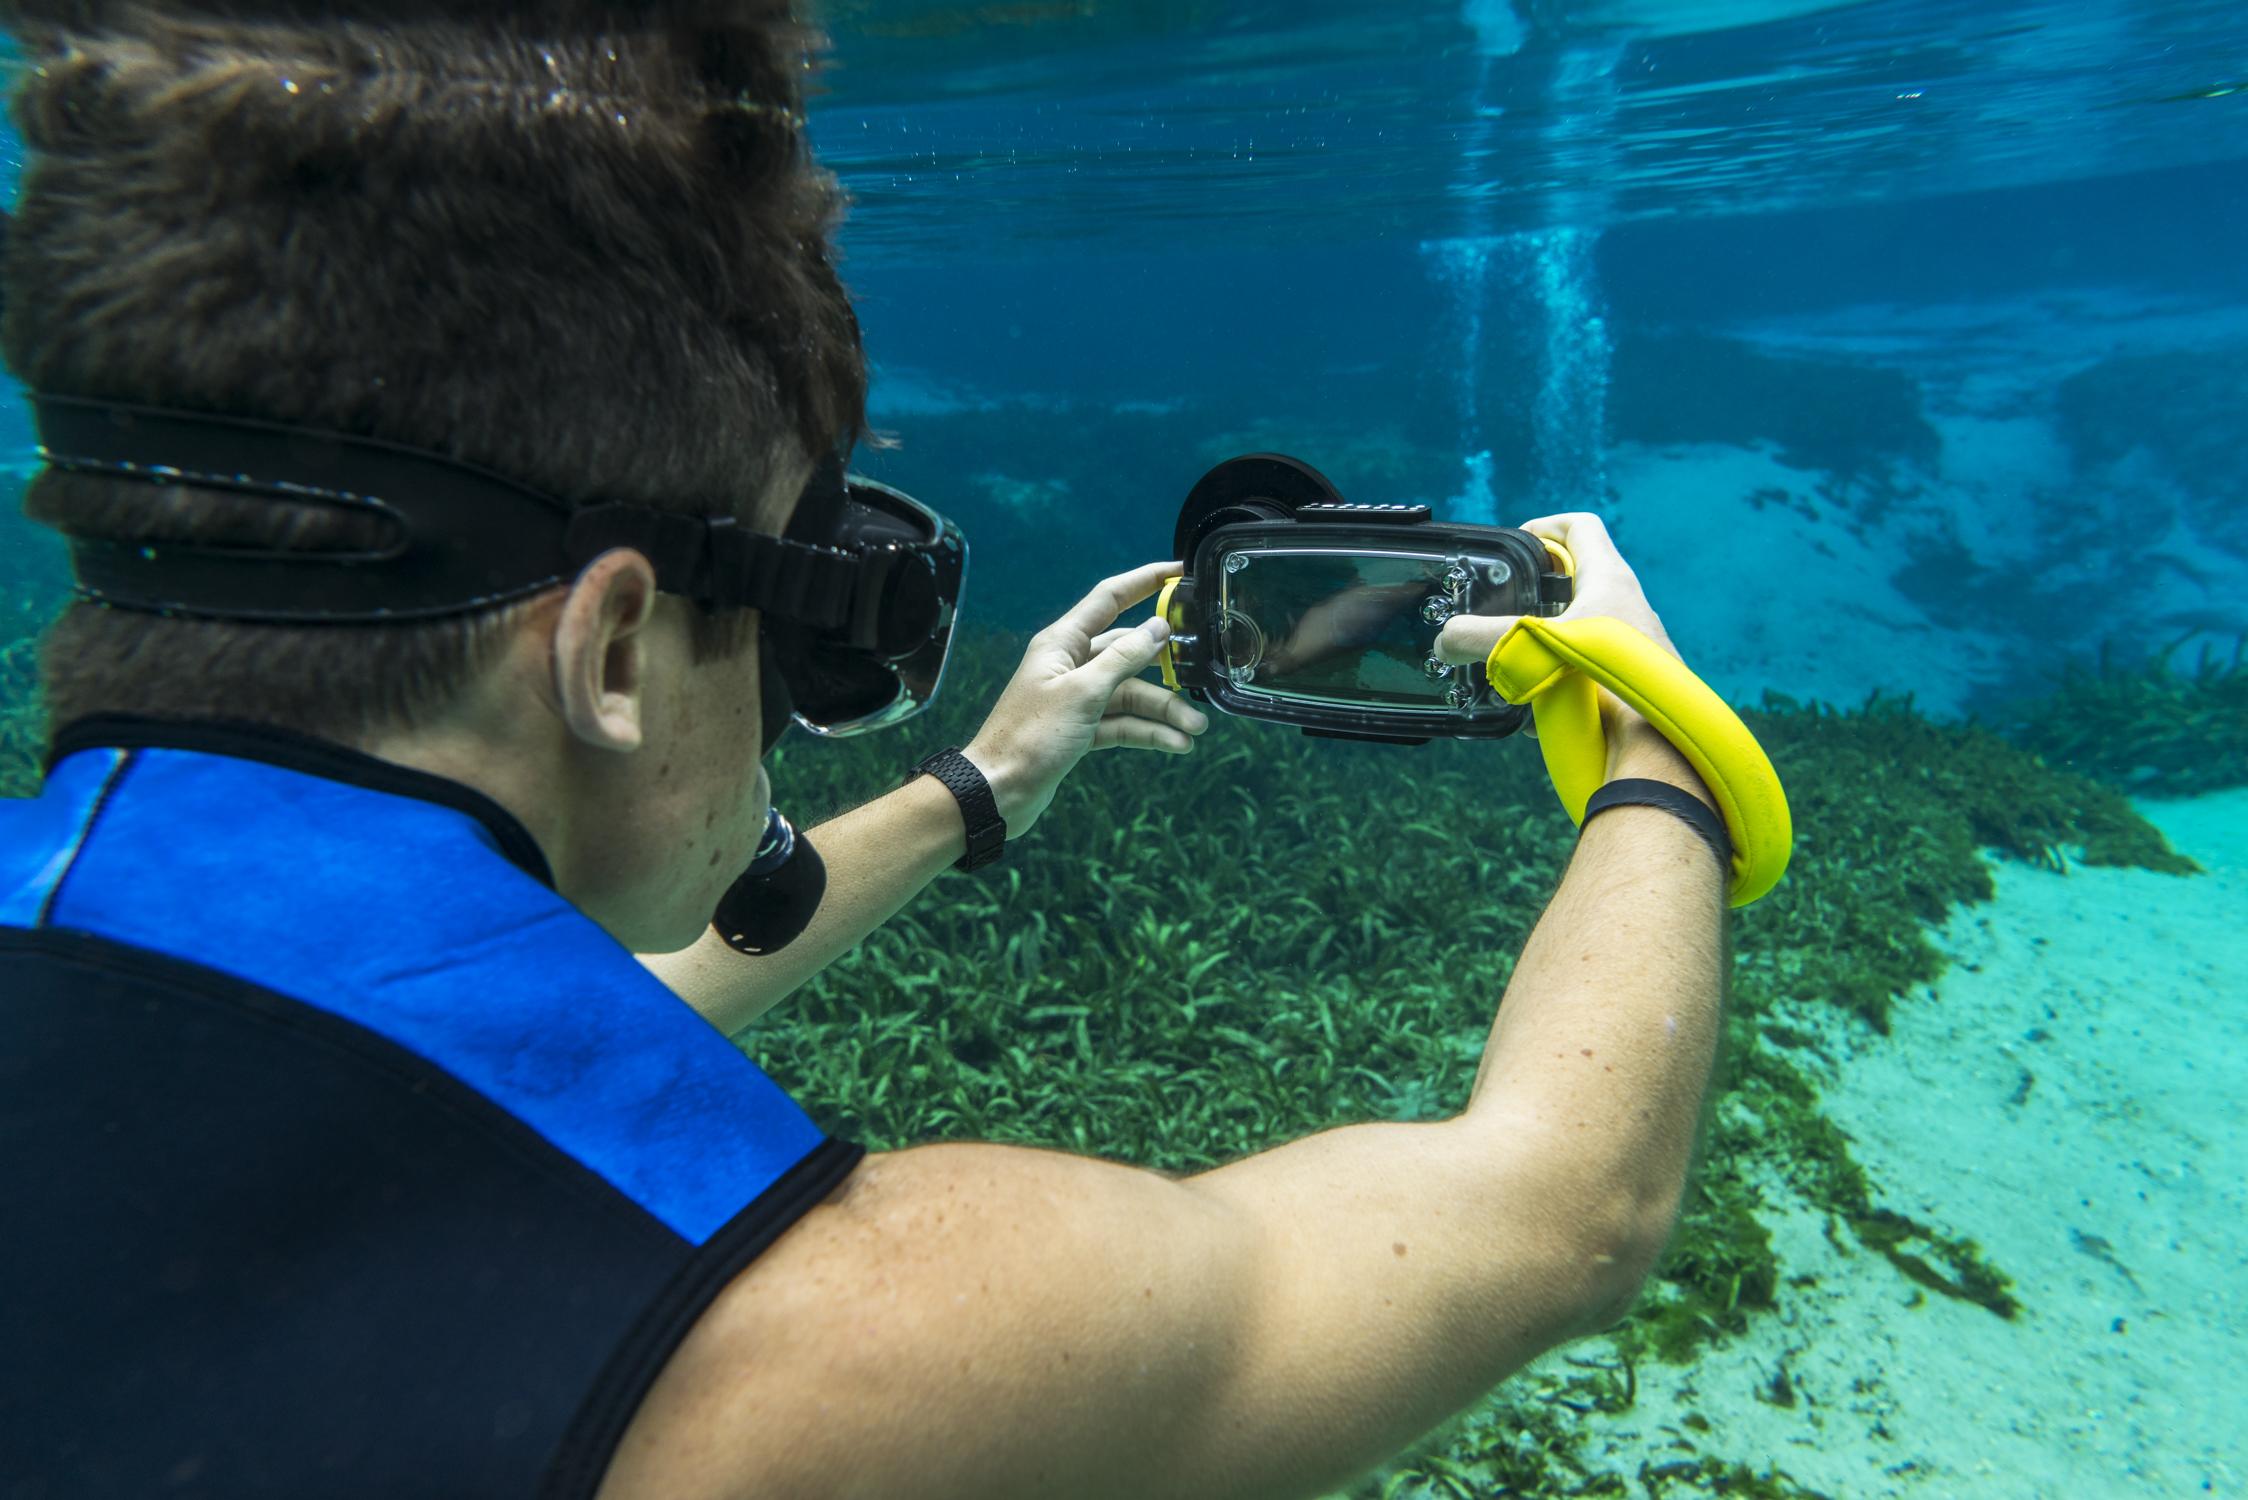 A snorkeler using a smartphone camera underwater